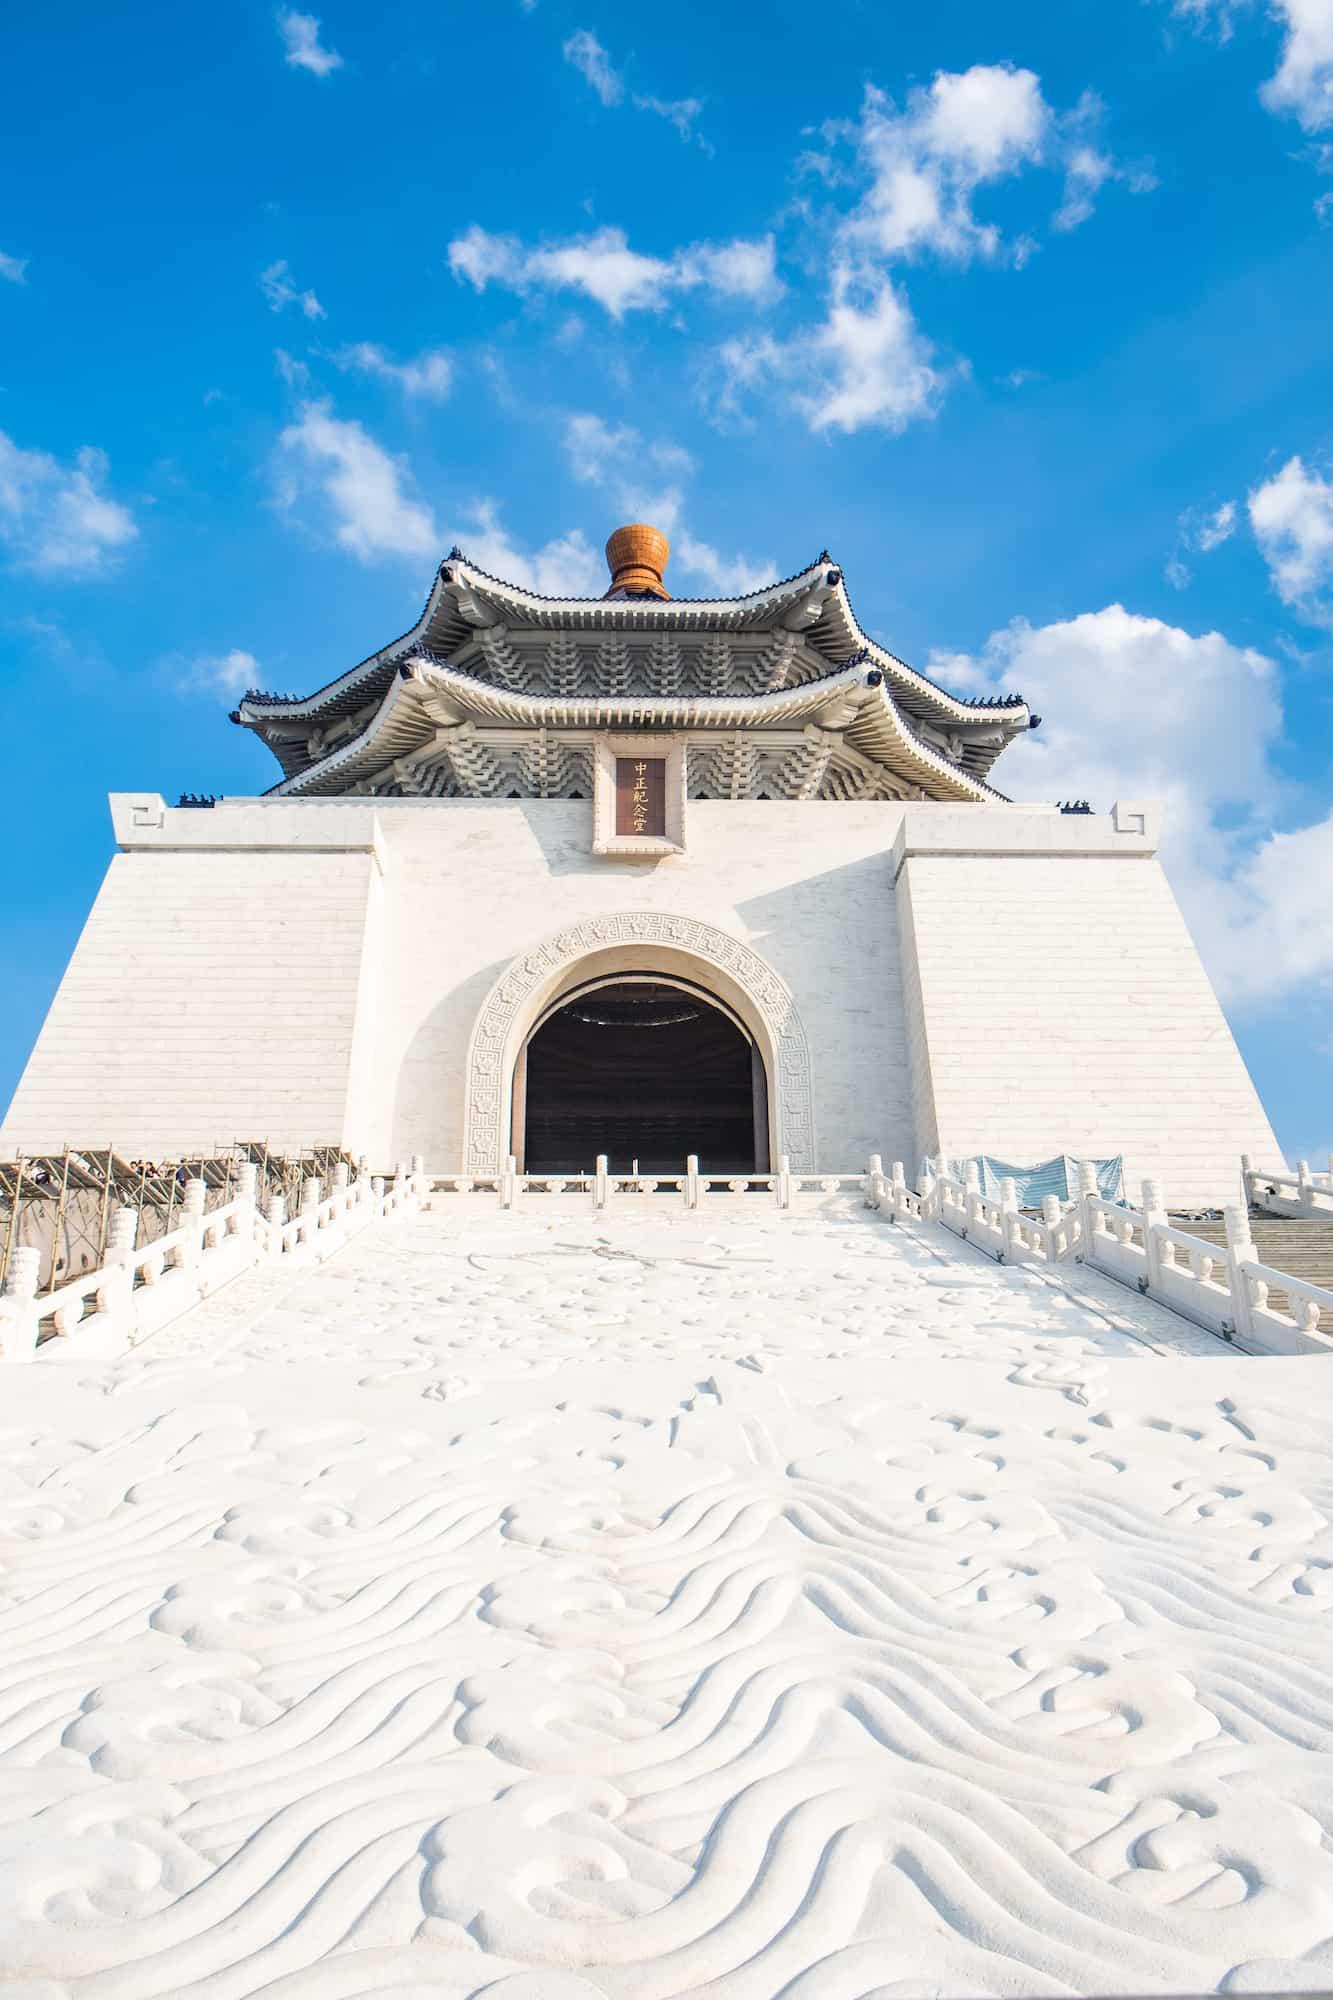 Taiwan Travel - Chiang Kai-shek Memorial Hall